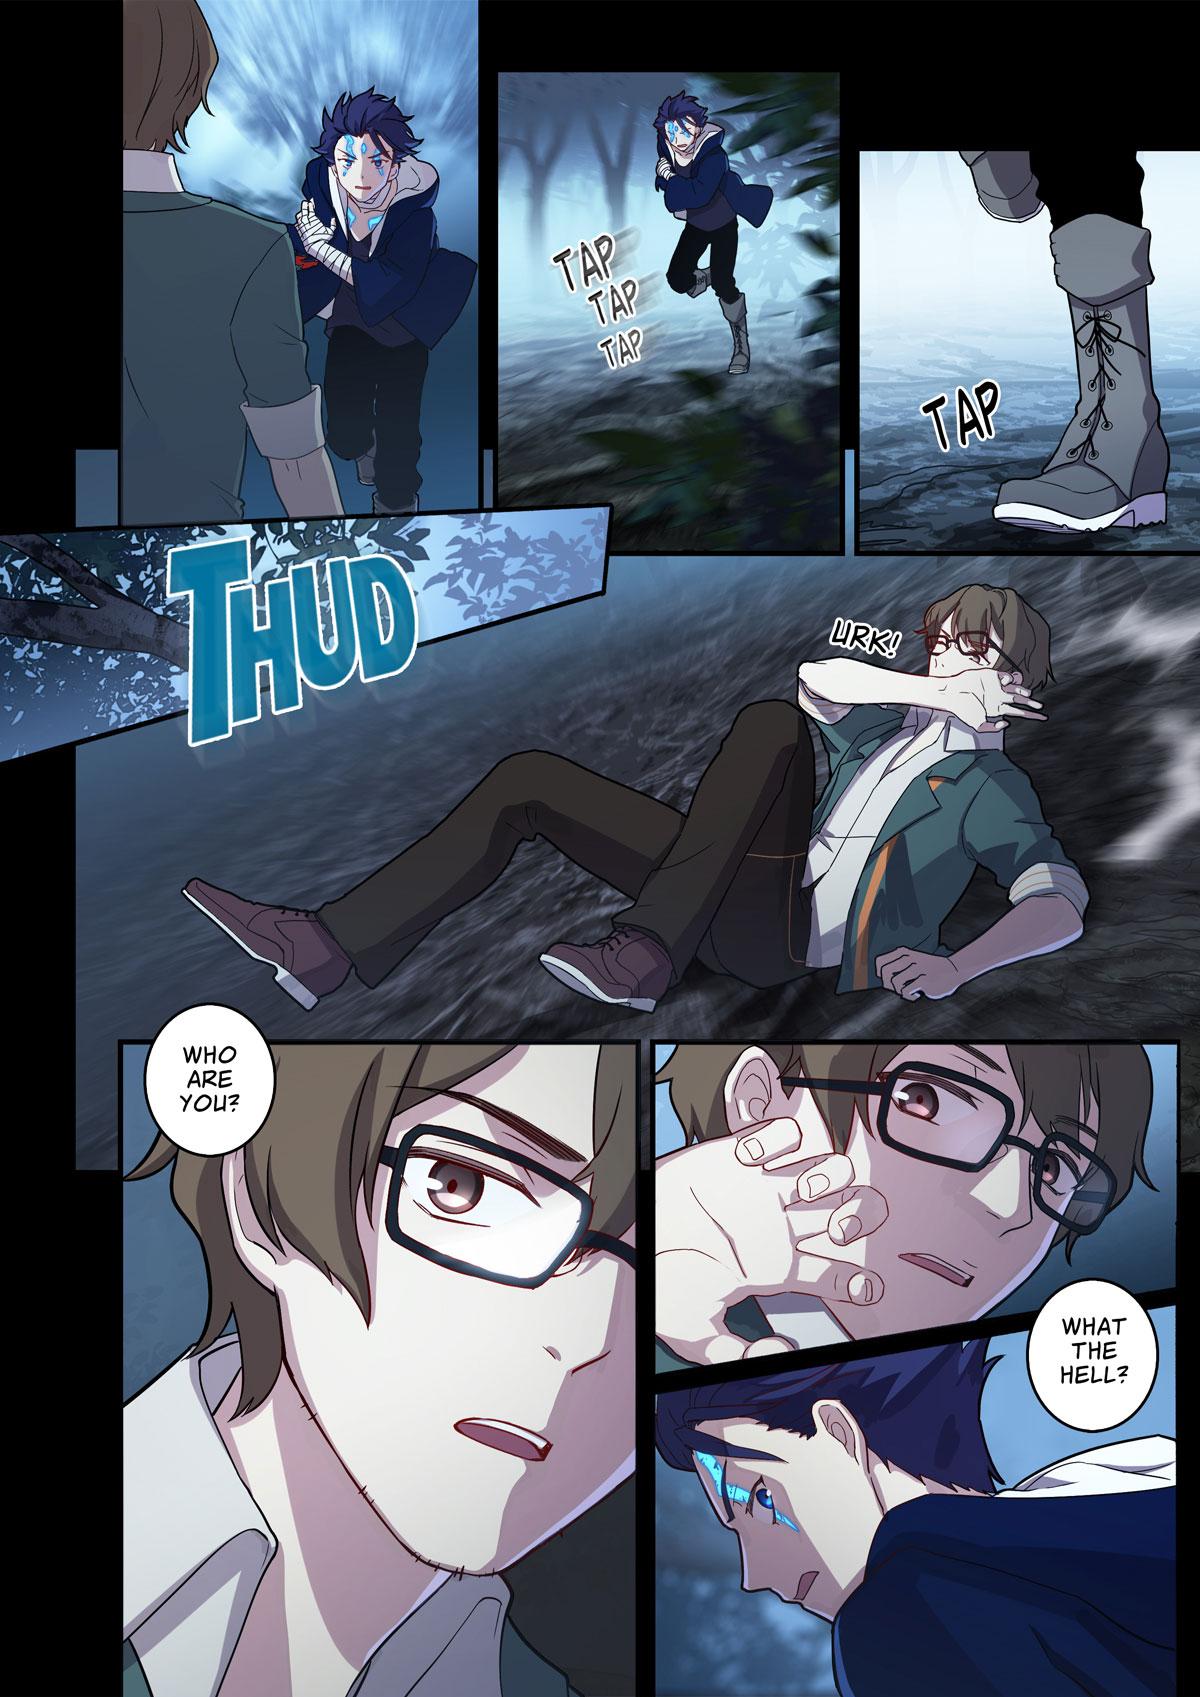 07 Exposed — Honkai Impact 3rd Manga Station